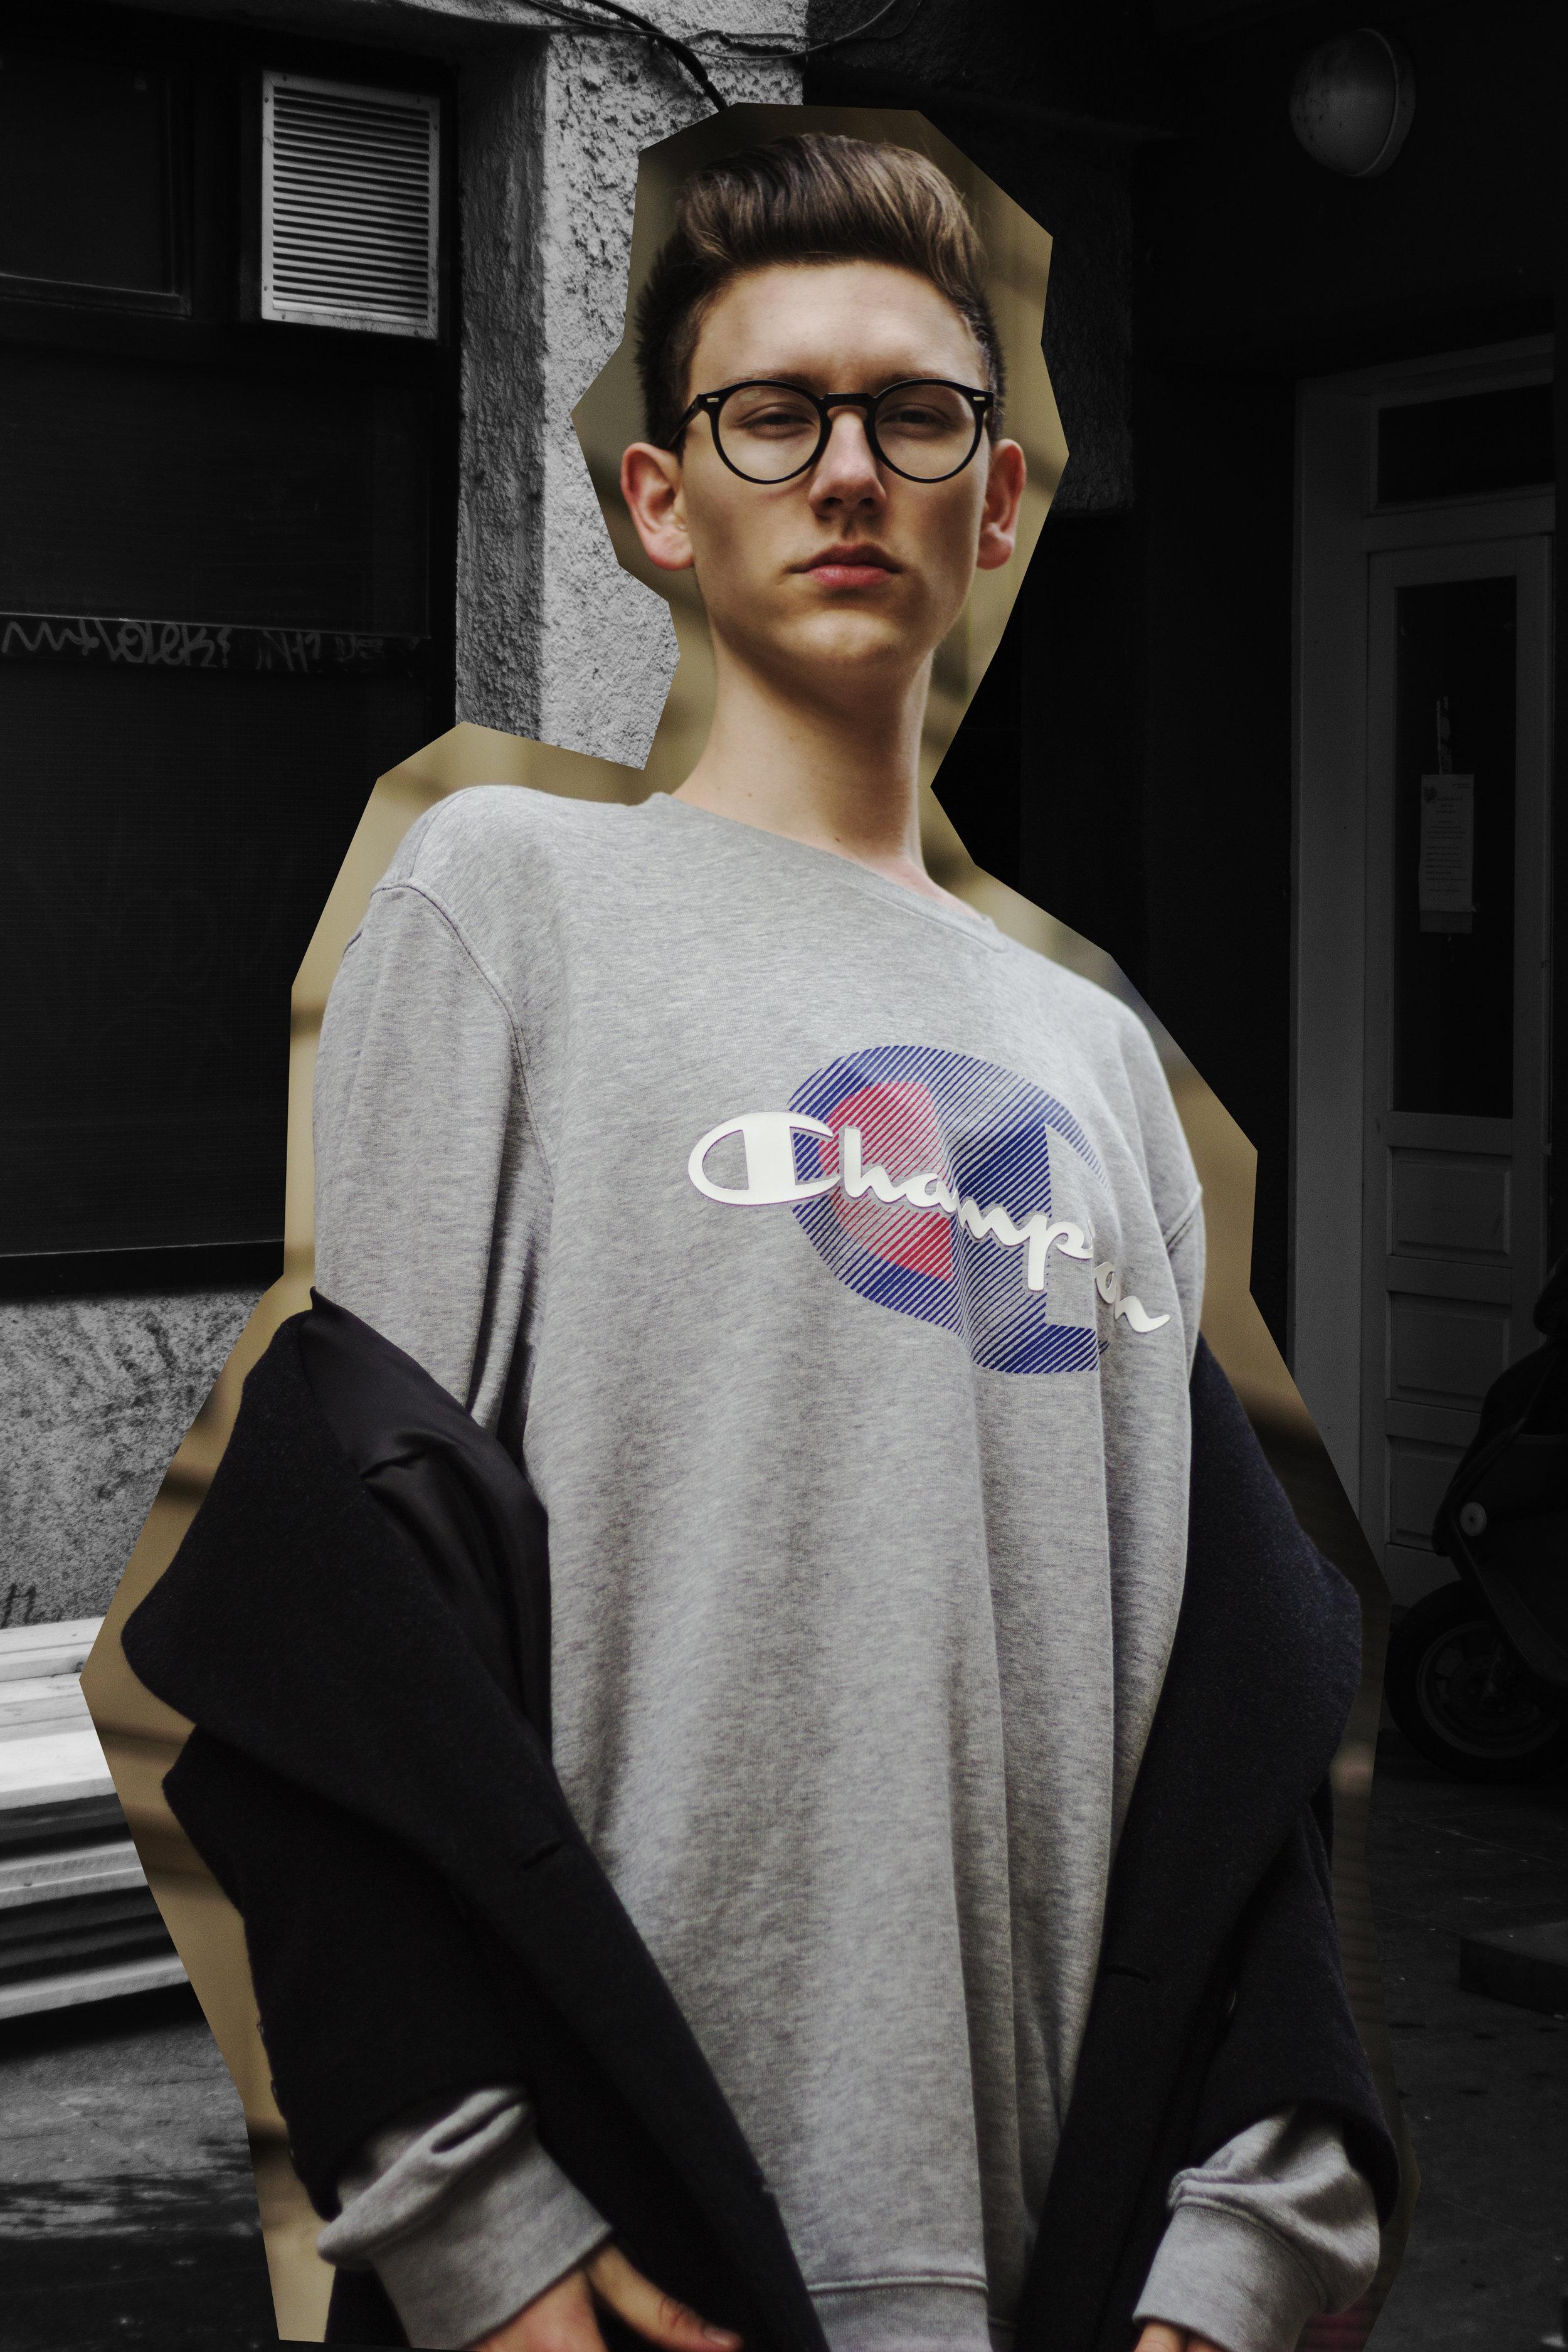 luka-lajic-expensive-reality-champion-hm-coat-boots-mens-fashion-croatia-blogger  (1).jpg